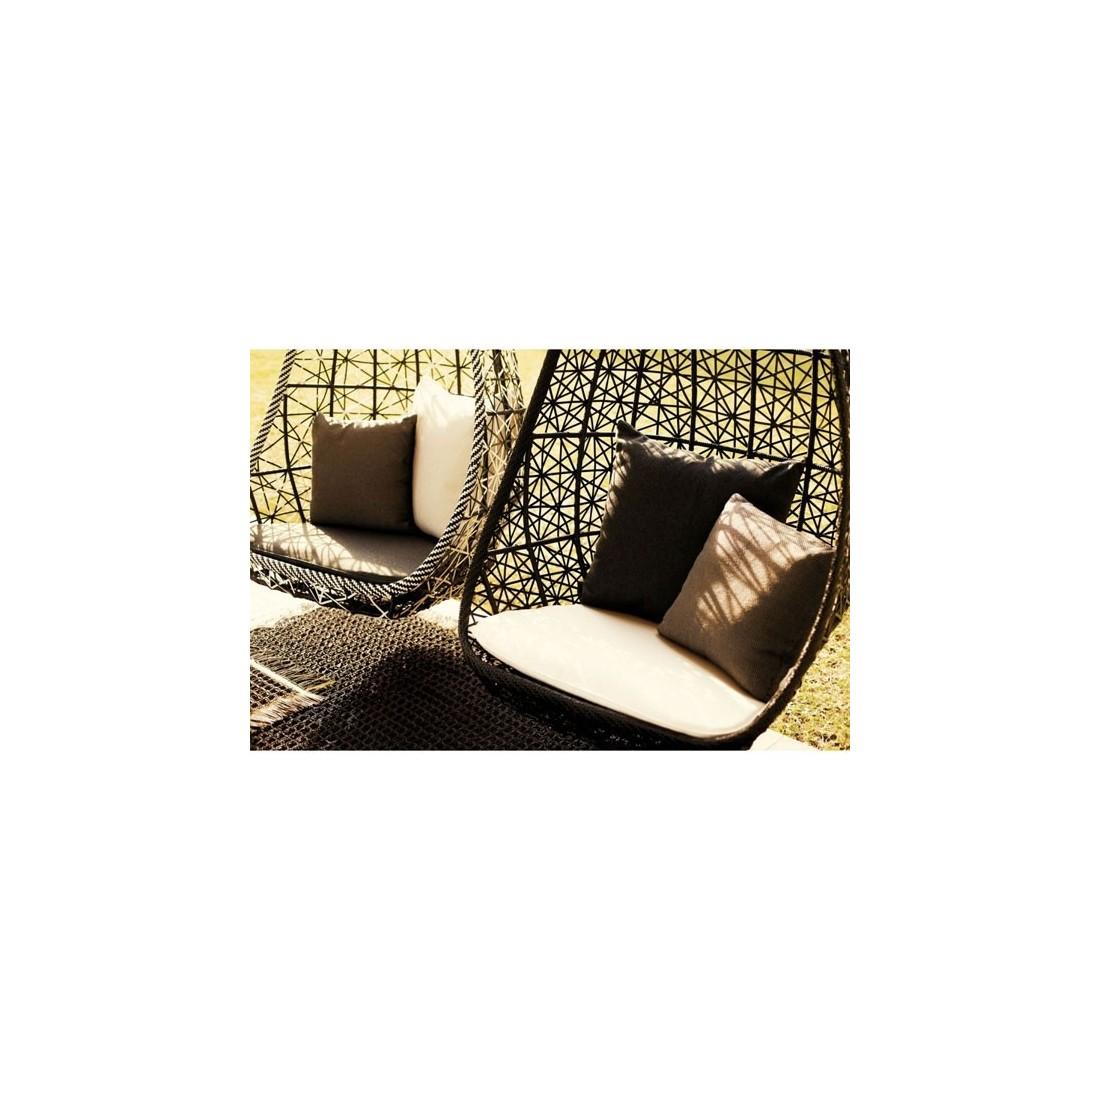 Fauteuil Suspendu Kettal | Mobilier Design Outdoor Exterieur ...